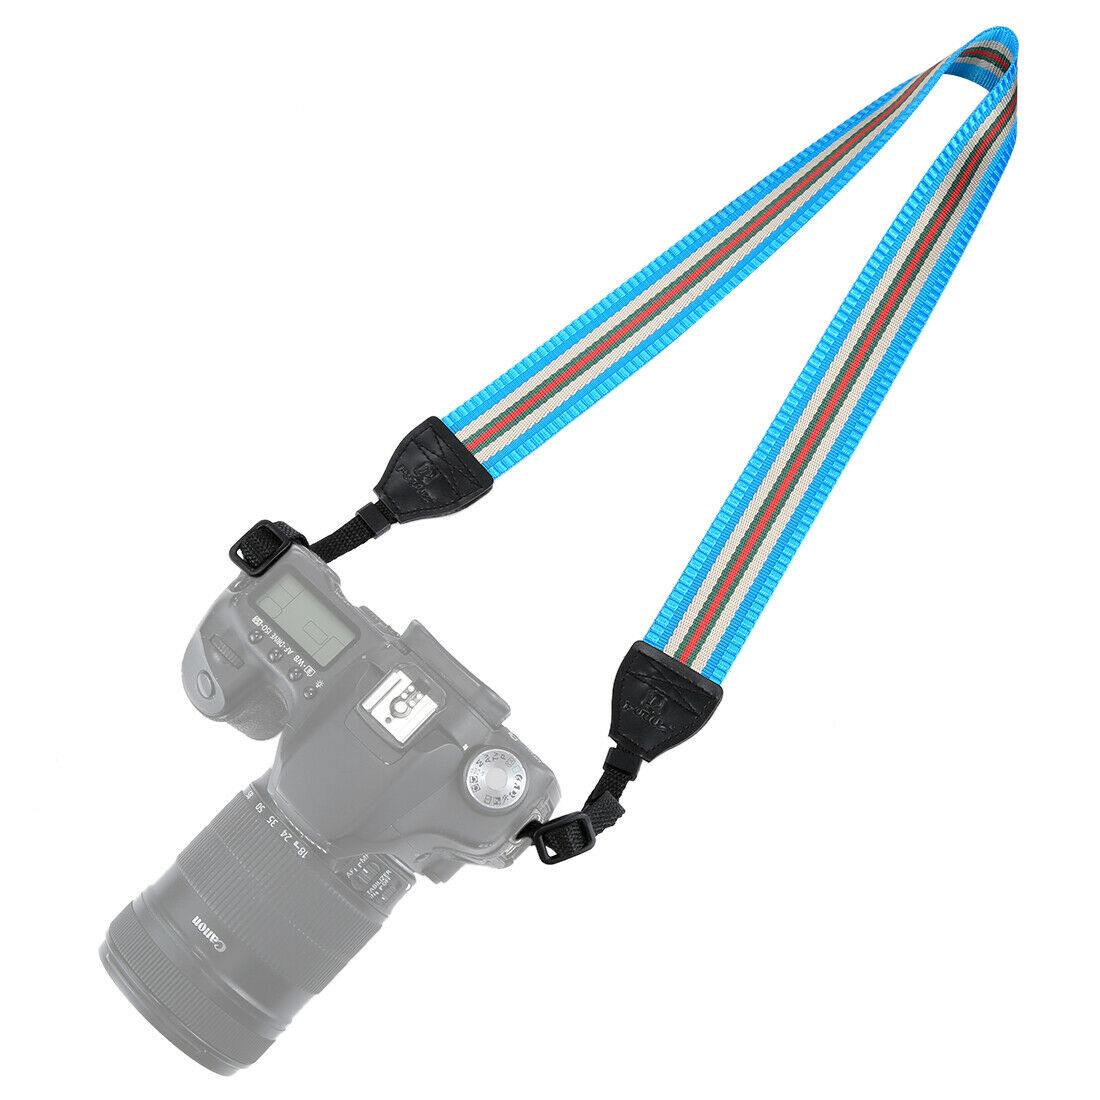 Vintage Anti-Slip Camera Strap - Light Blue